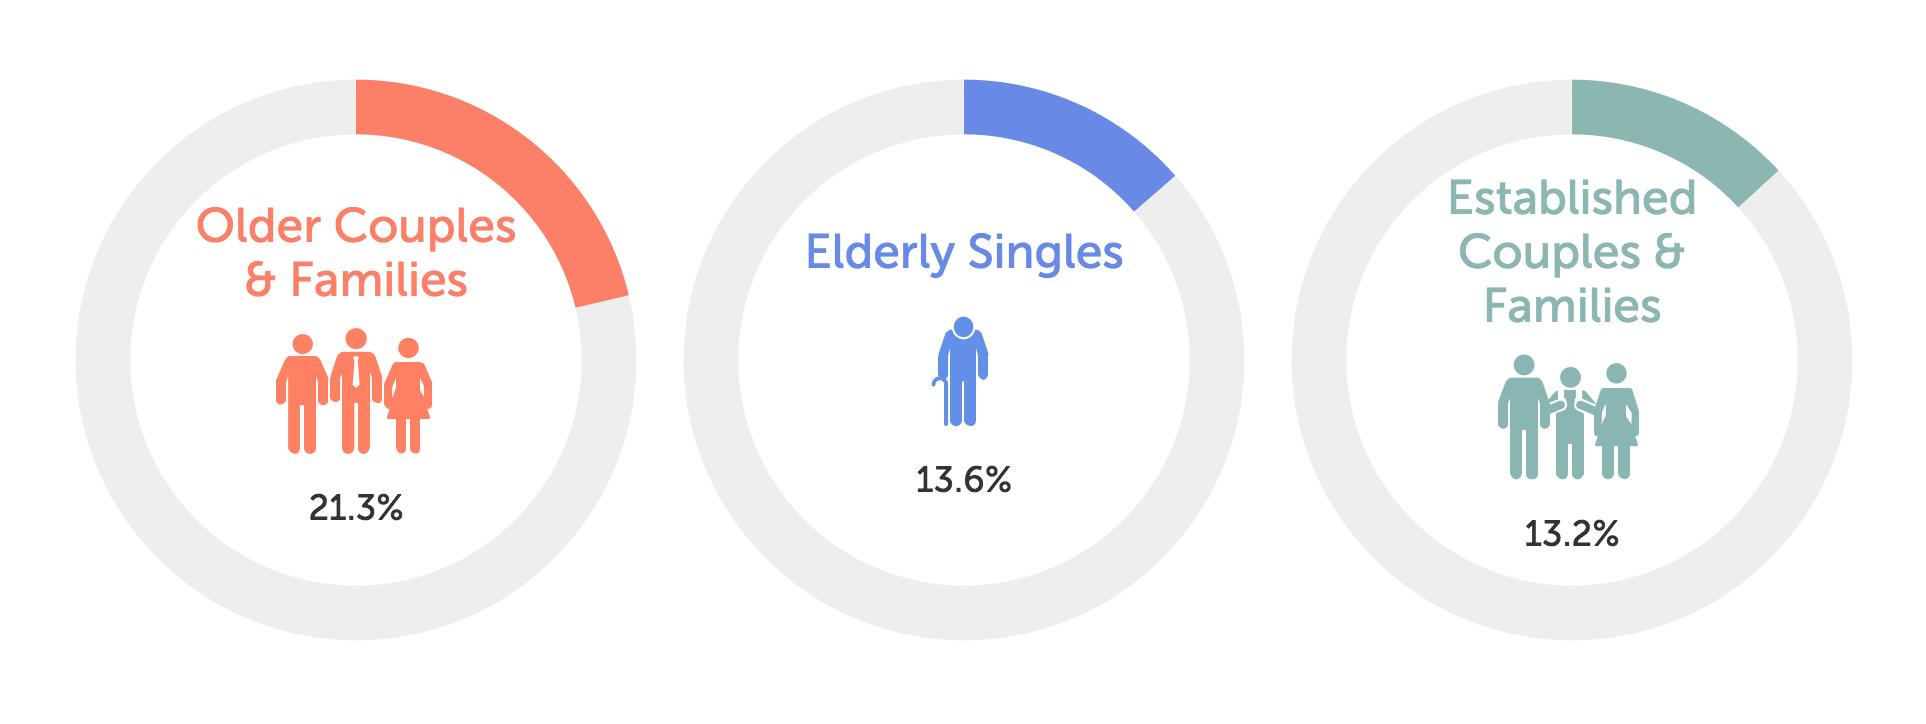 Aspley Suburb Profile on RealEstate.com.au